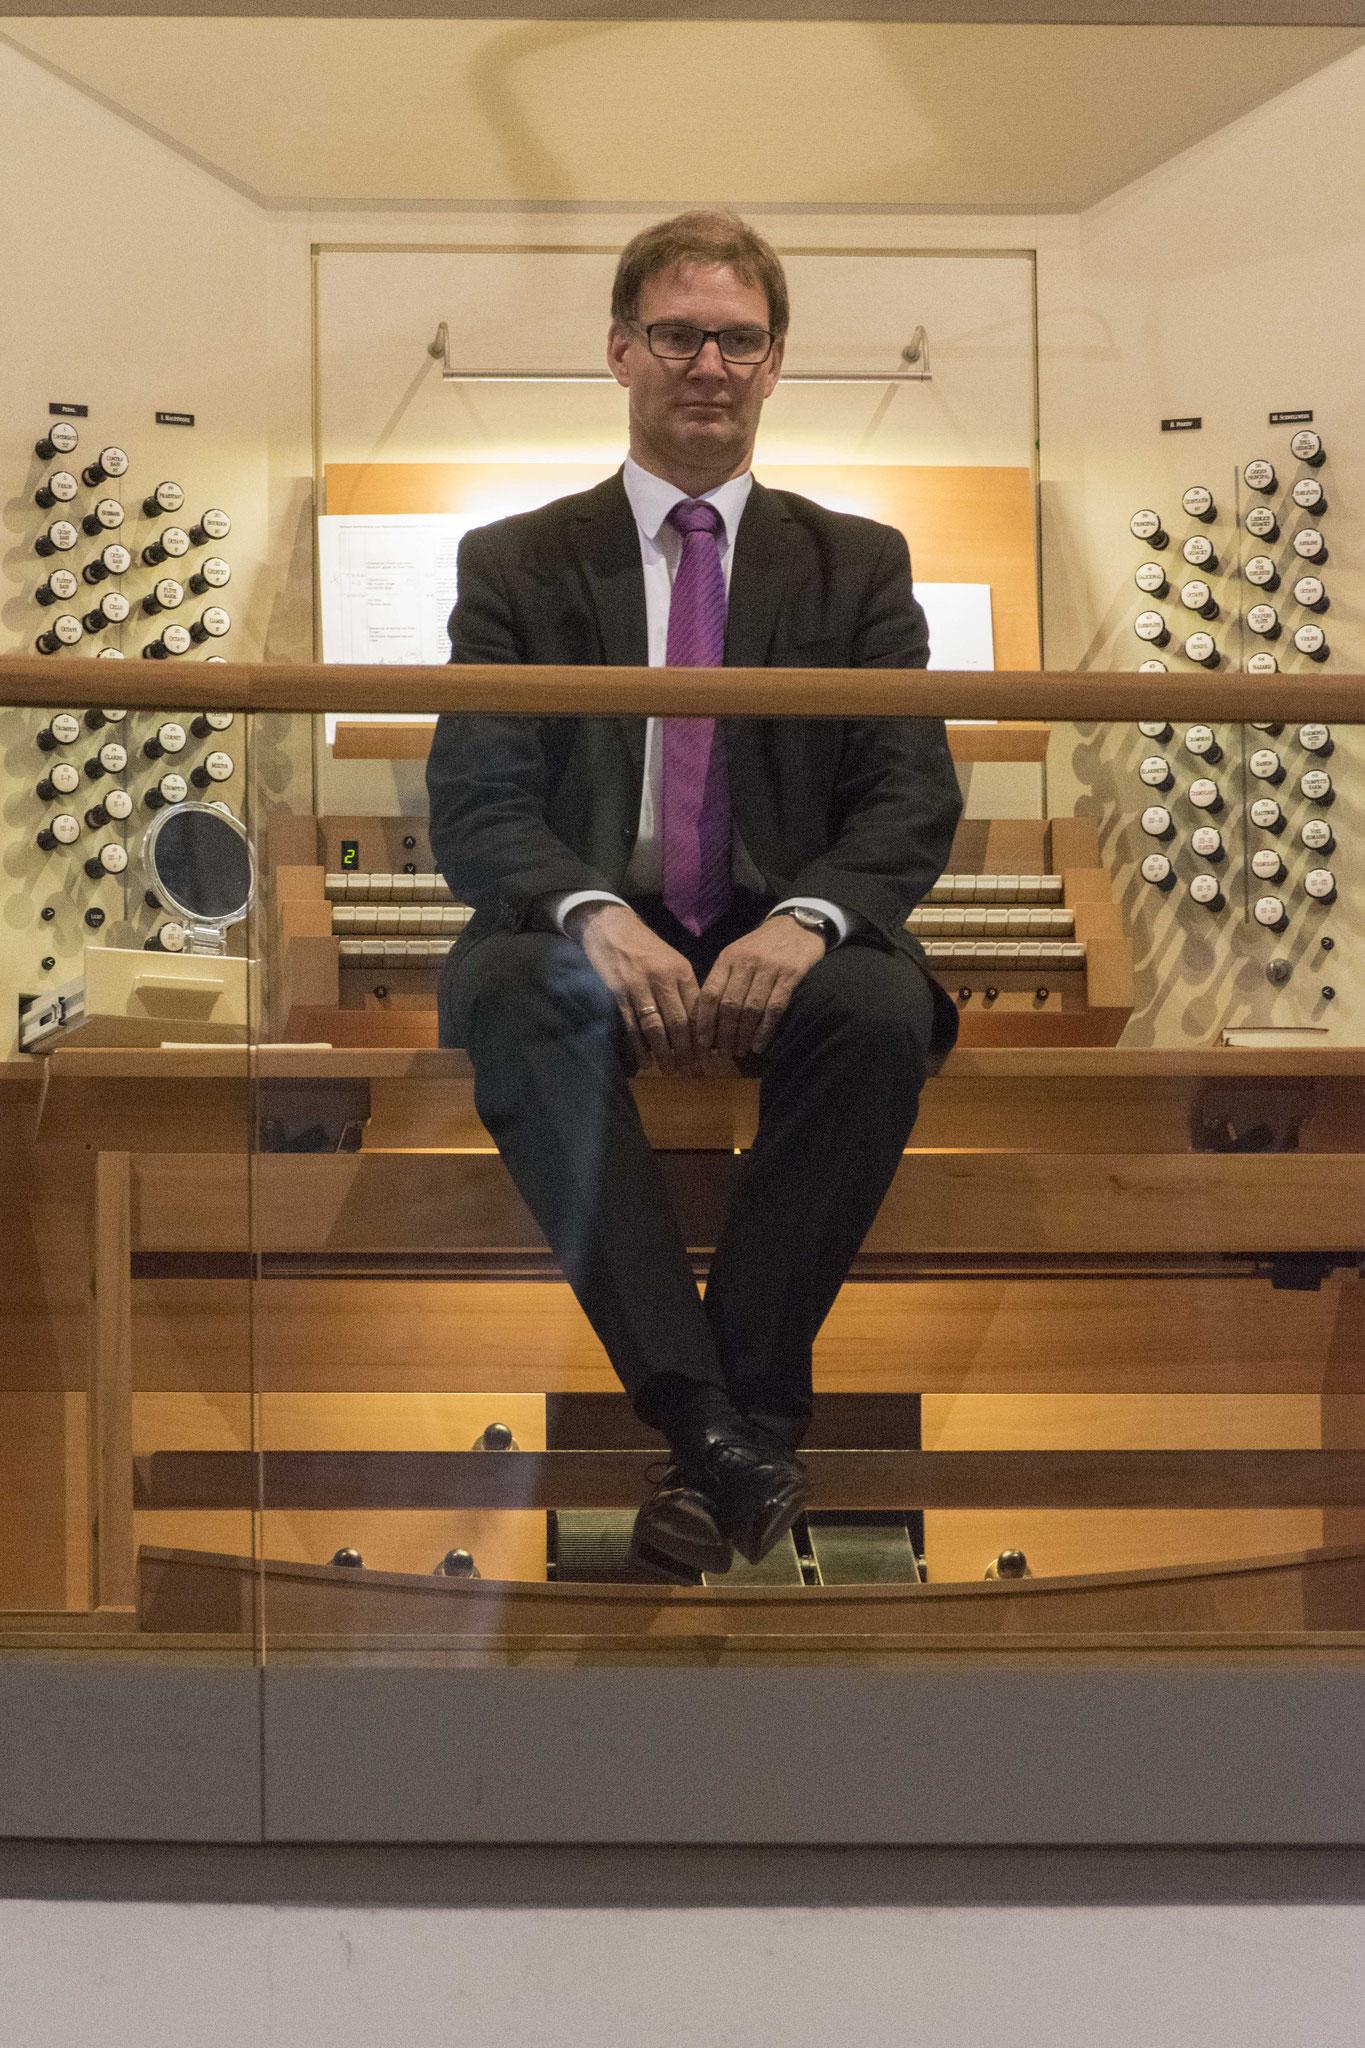 Organist Nils Kuppe